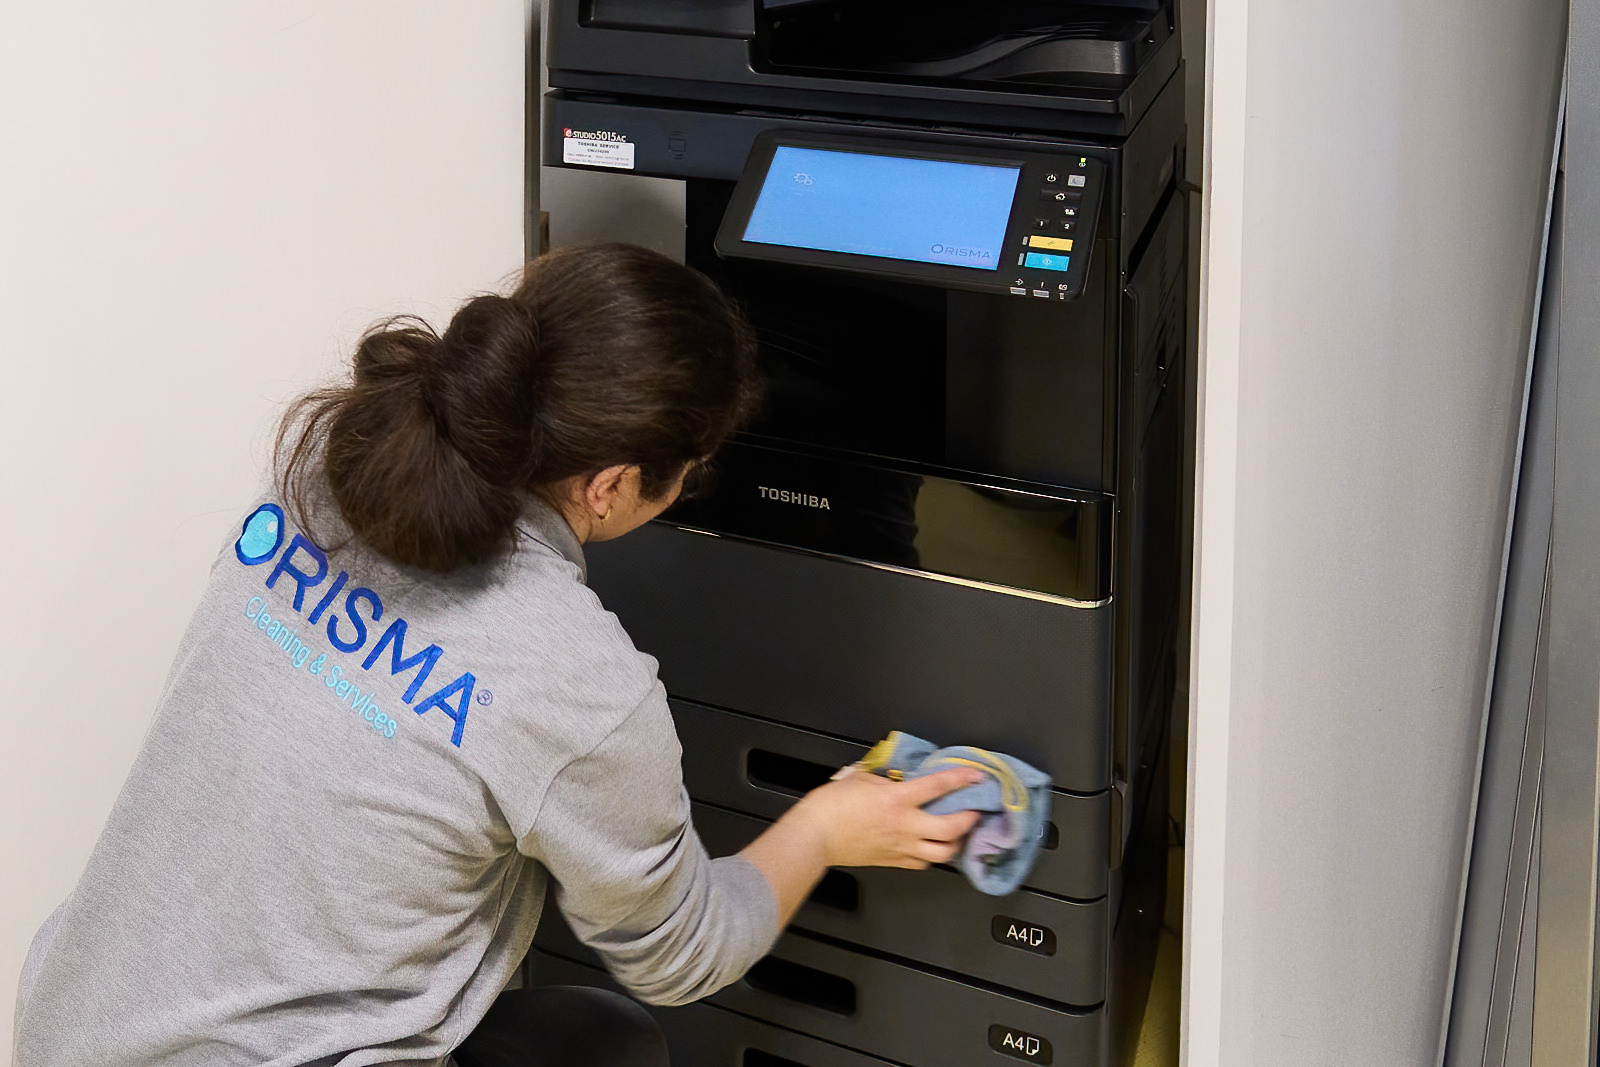 20210504 Orisma kantoor 0052